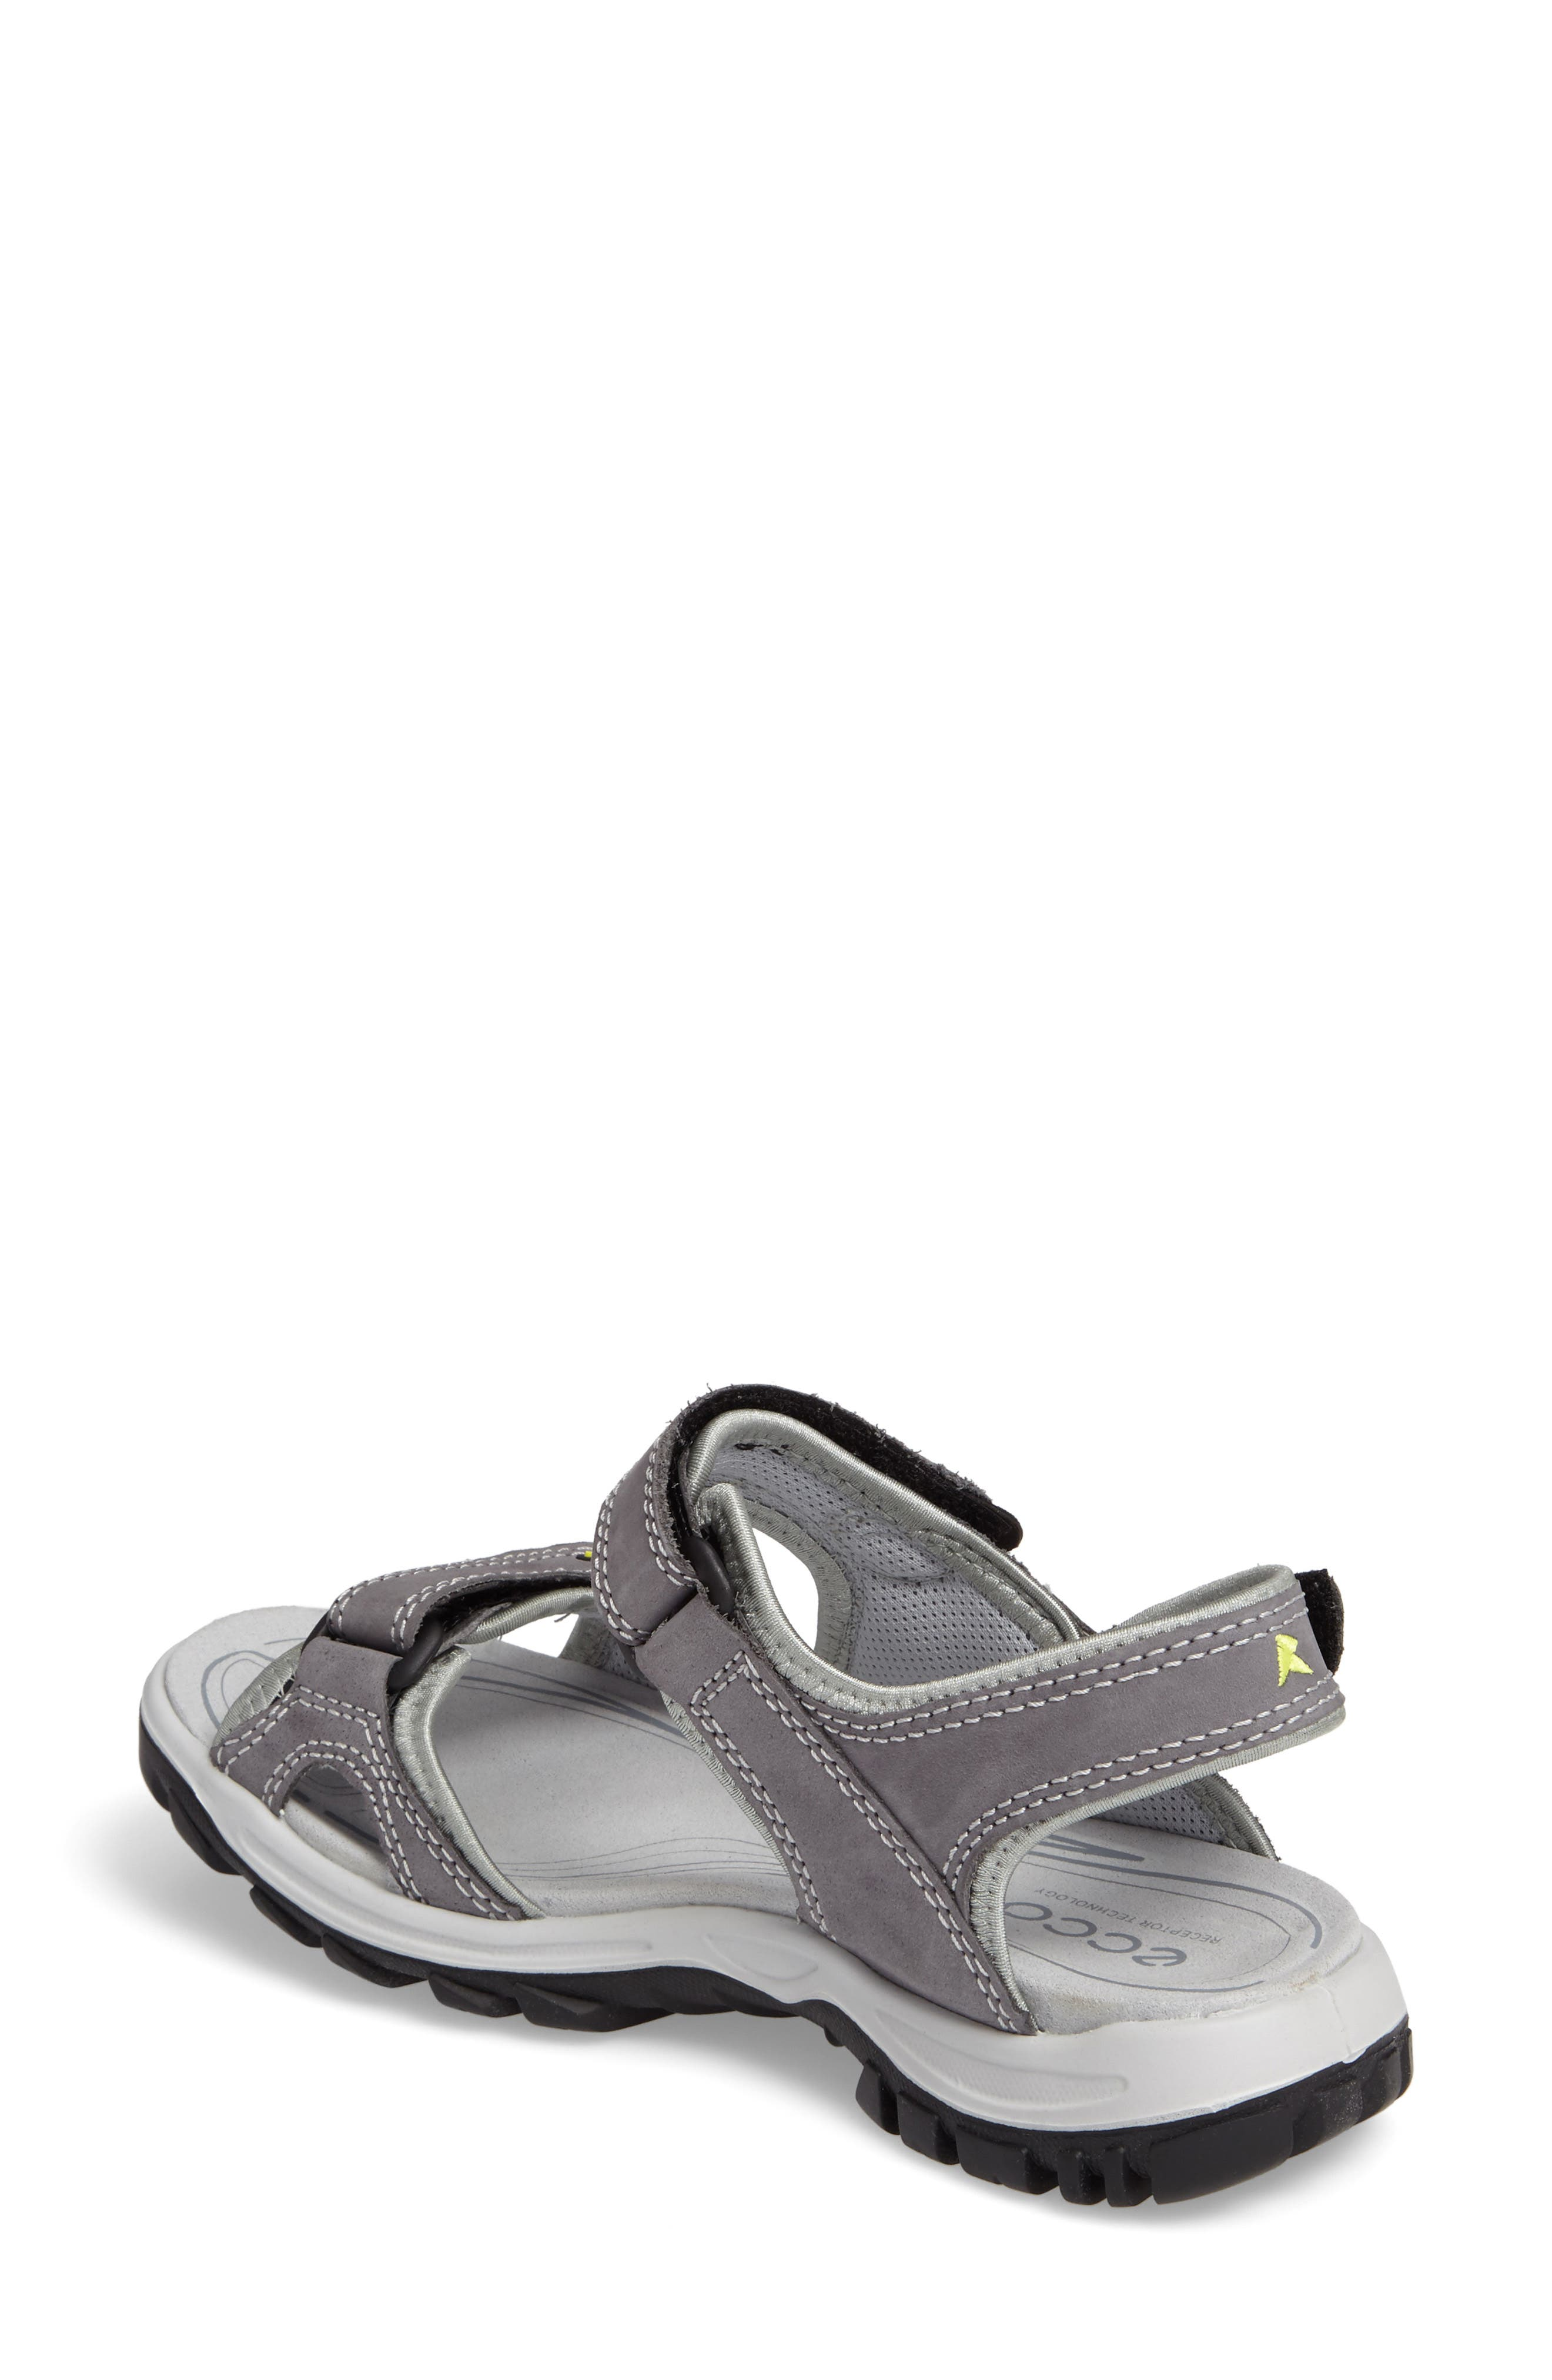 'Offroad' Lightweight Sandal,                             Alternate thumbnail 2, color,                             Titanium Leather